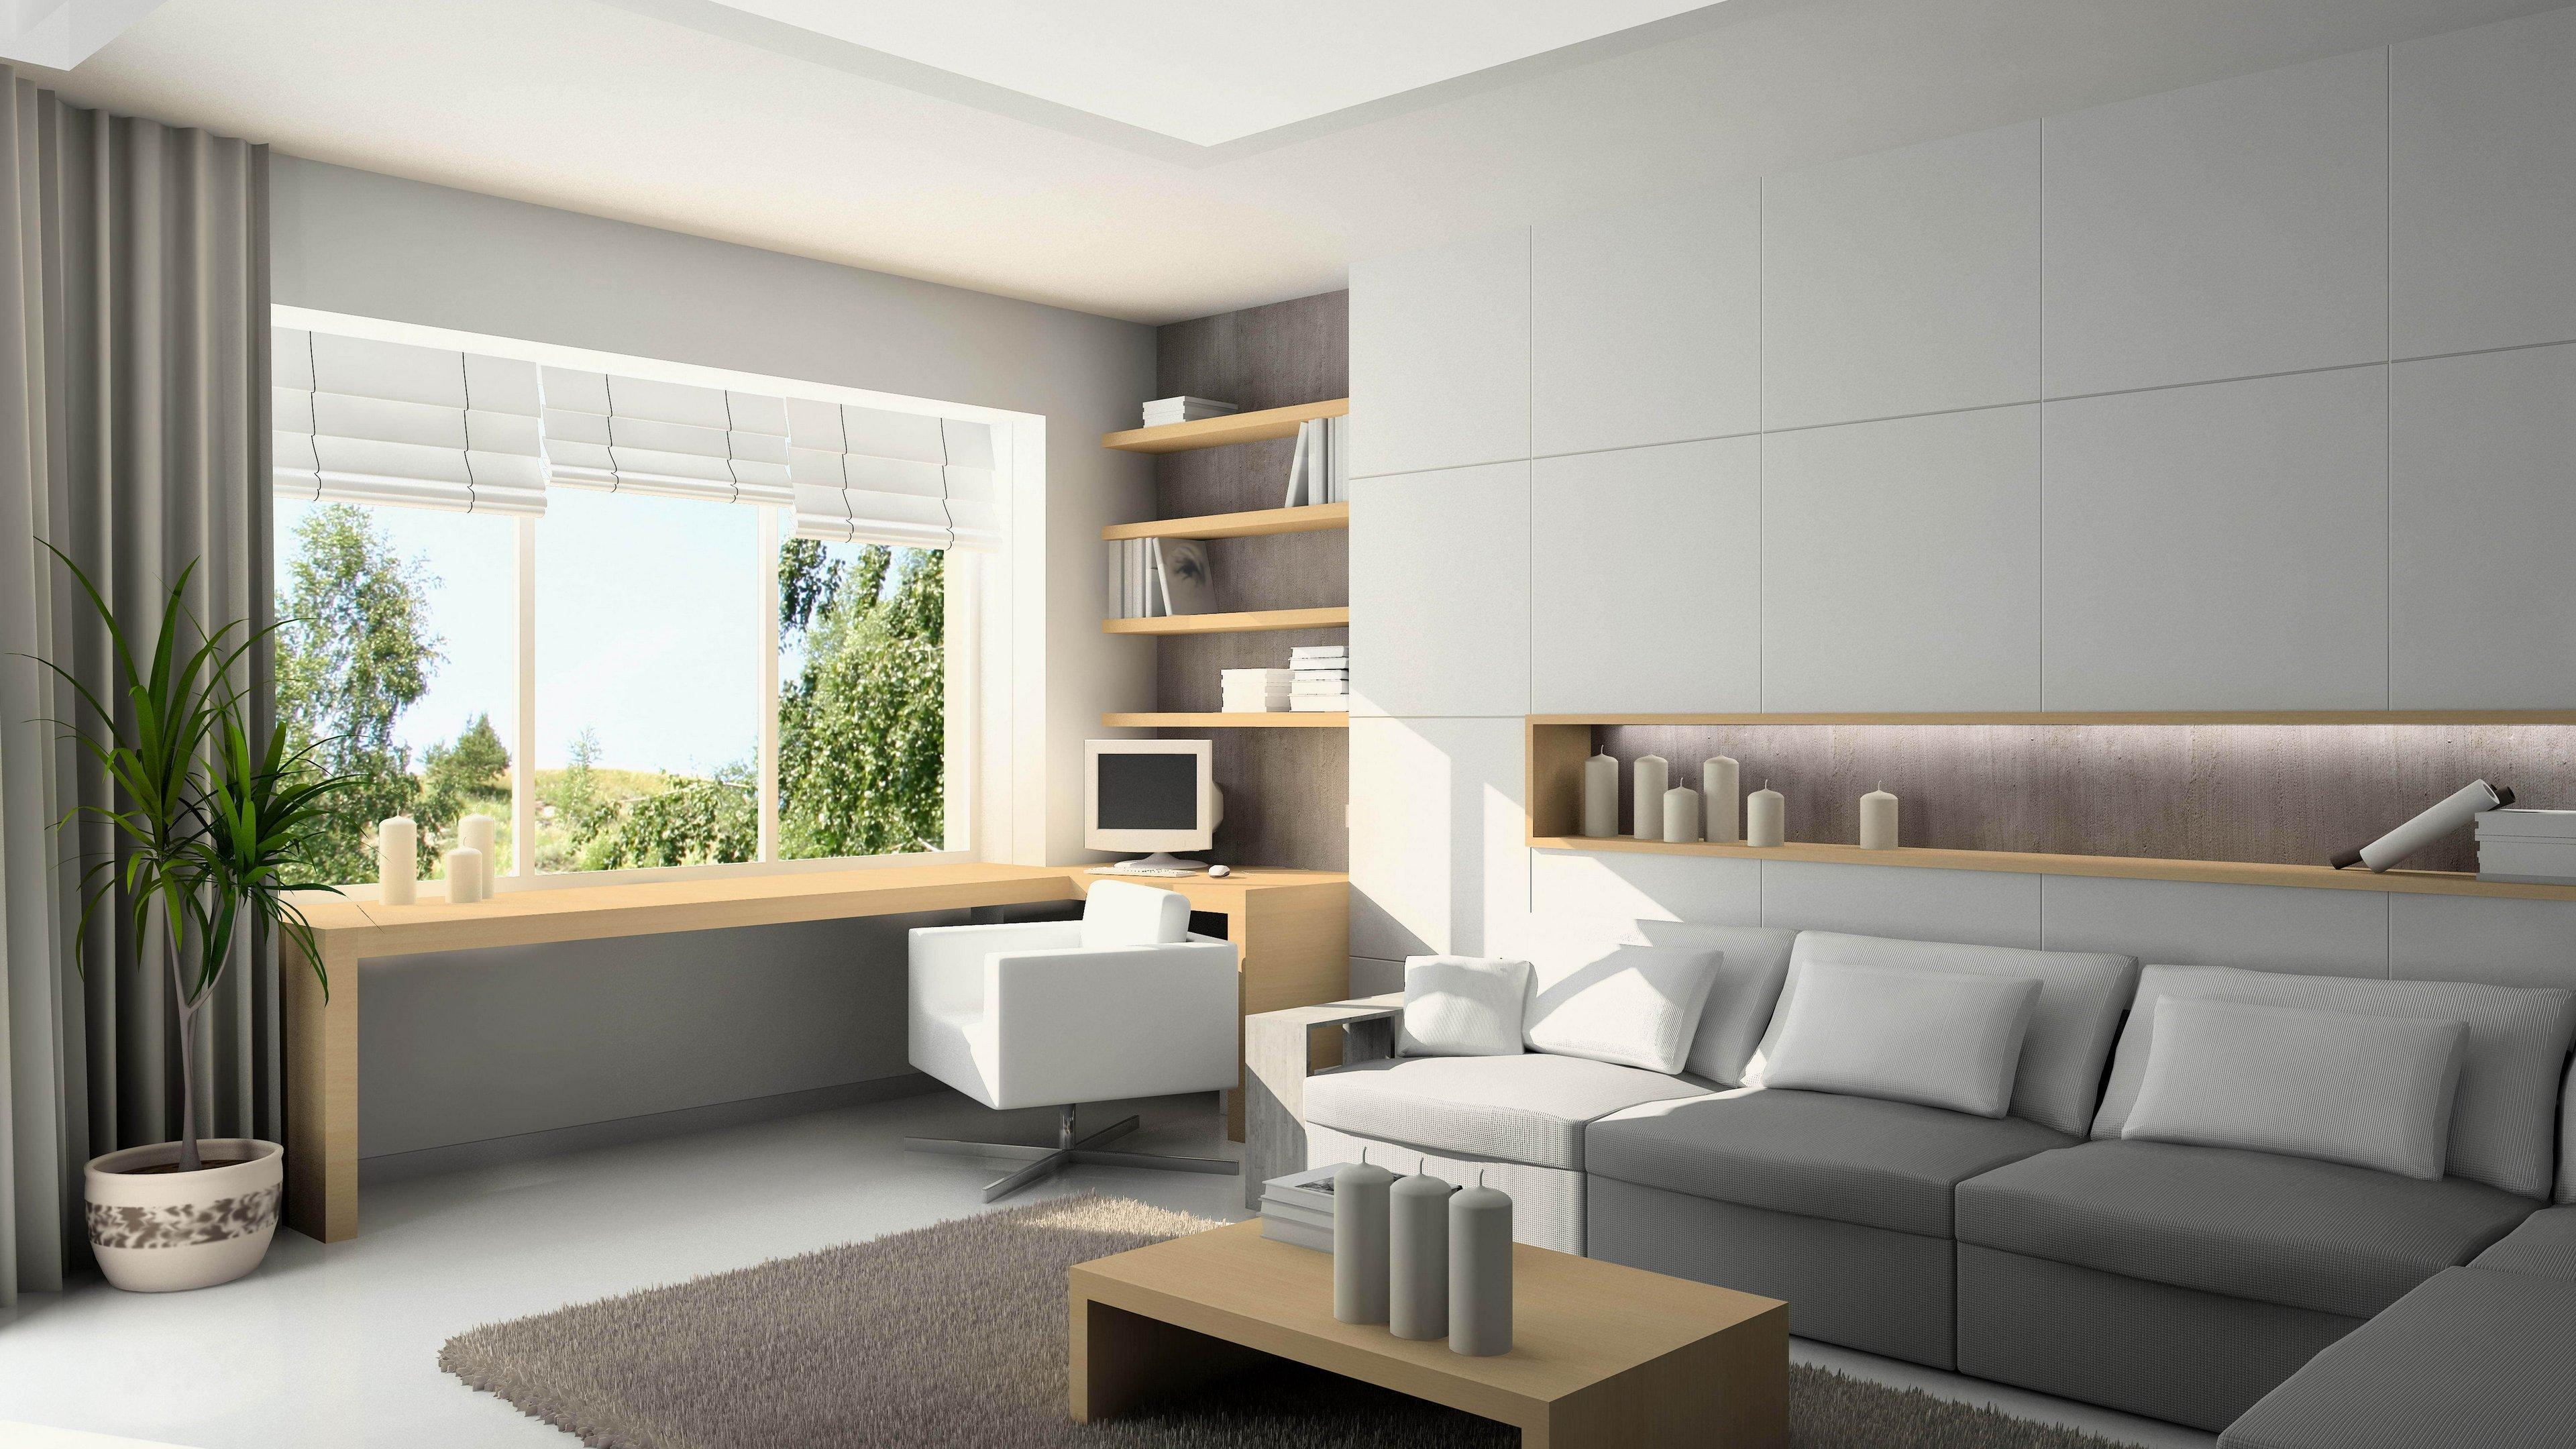 La Maison Du Dressing interior design life home room wallpaper | 3840x2160